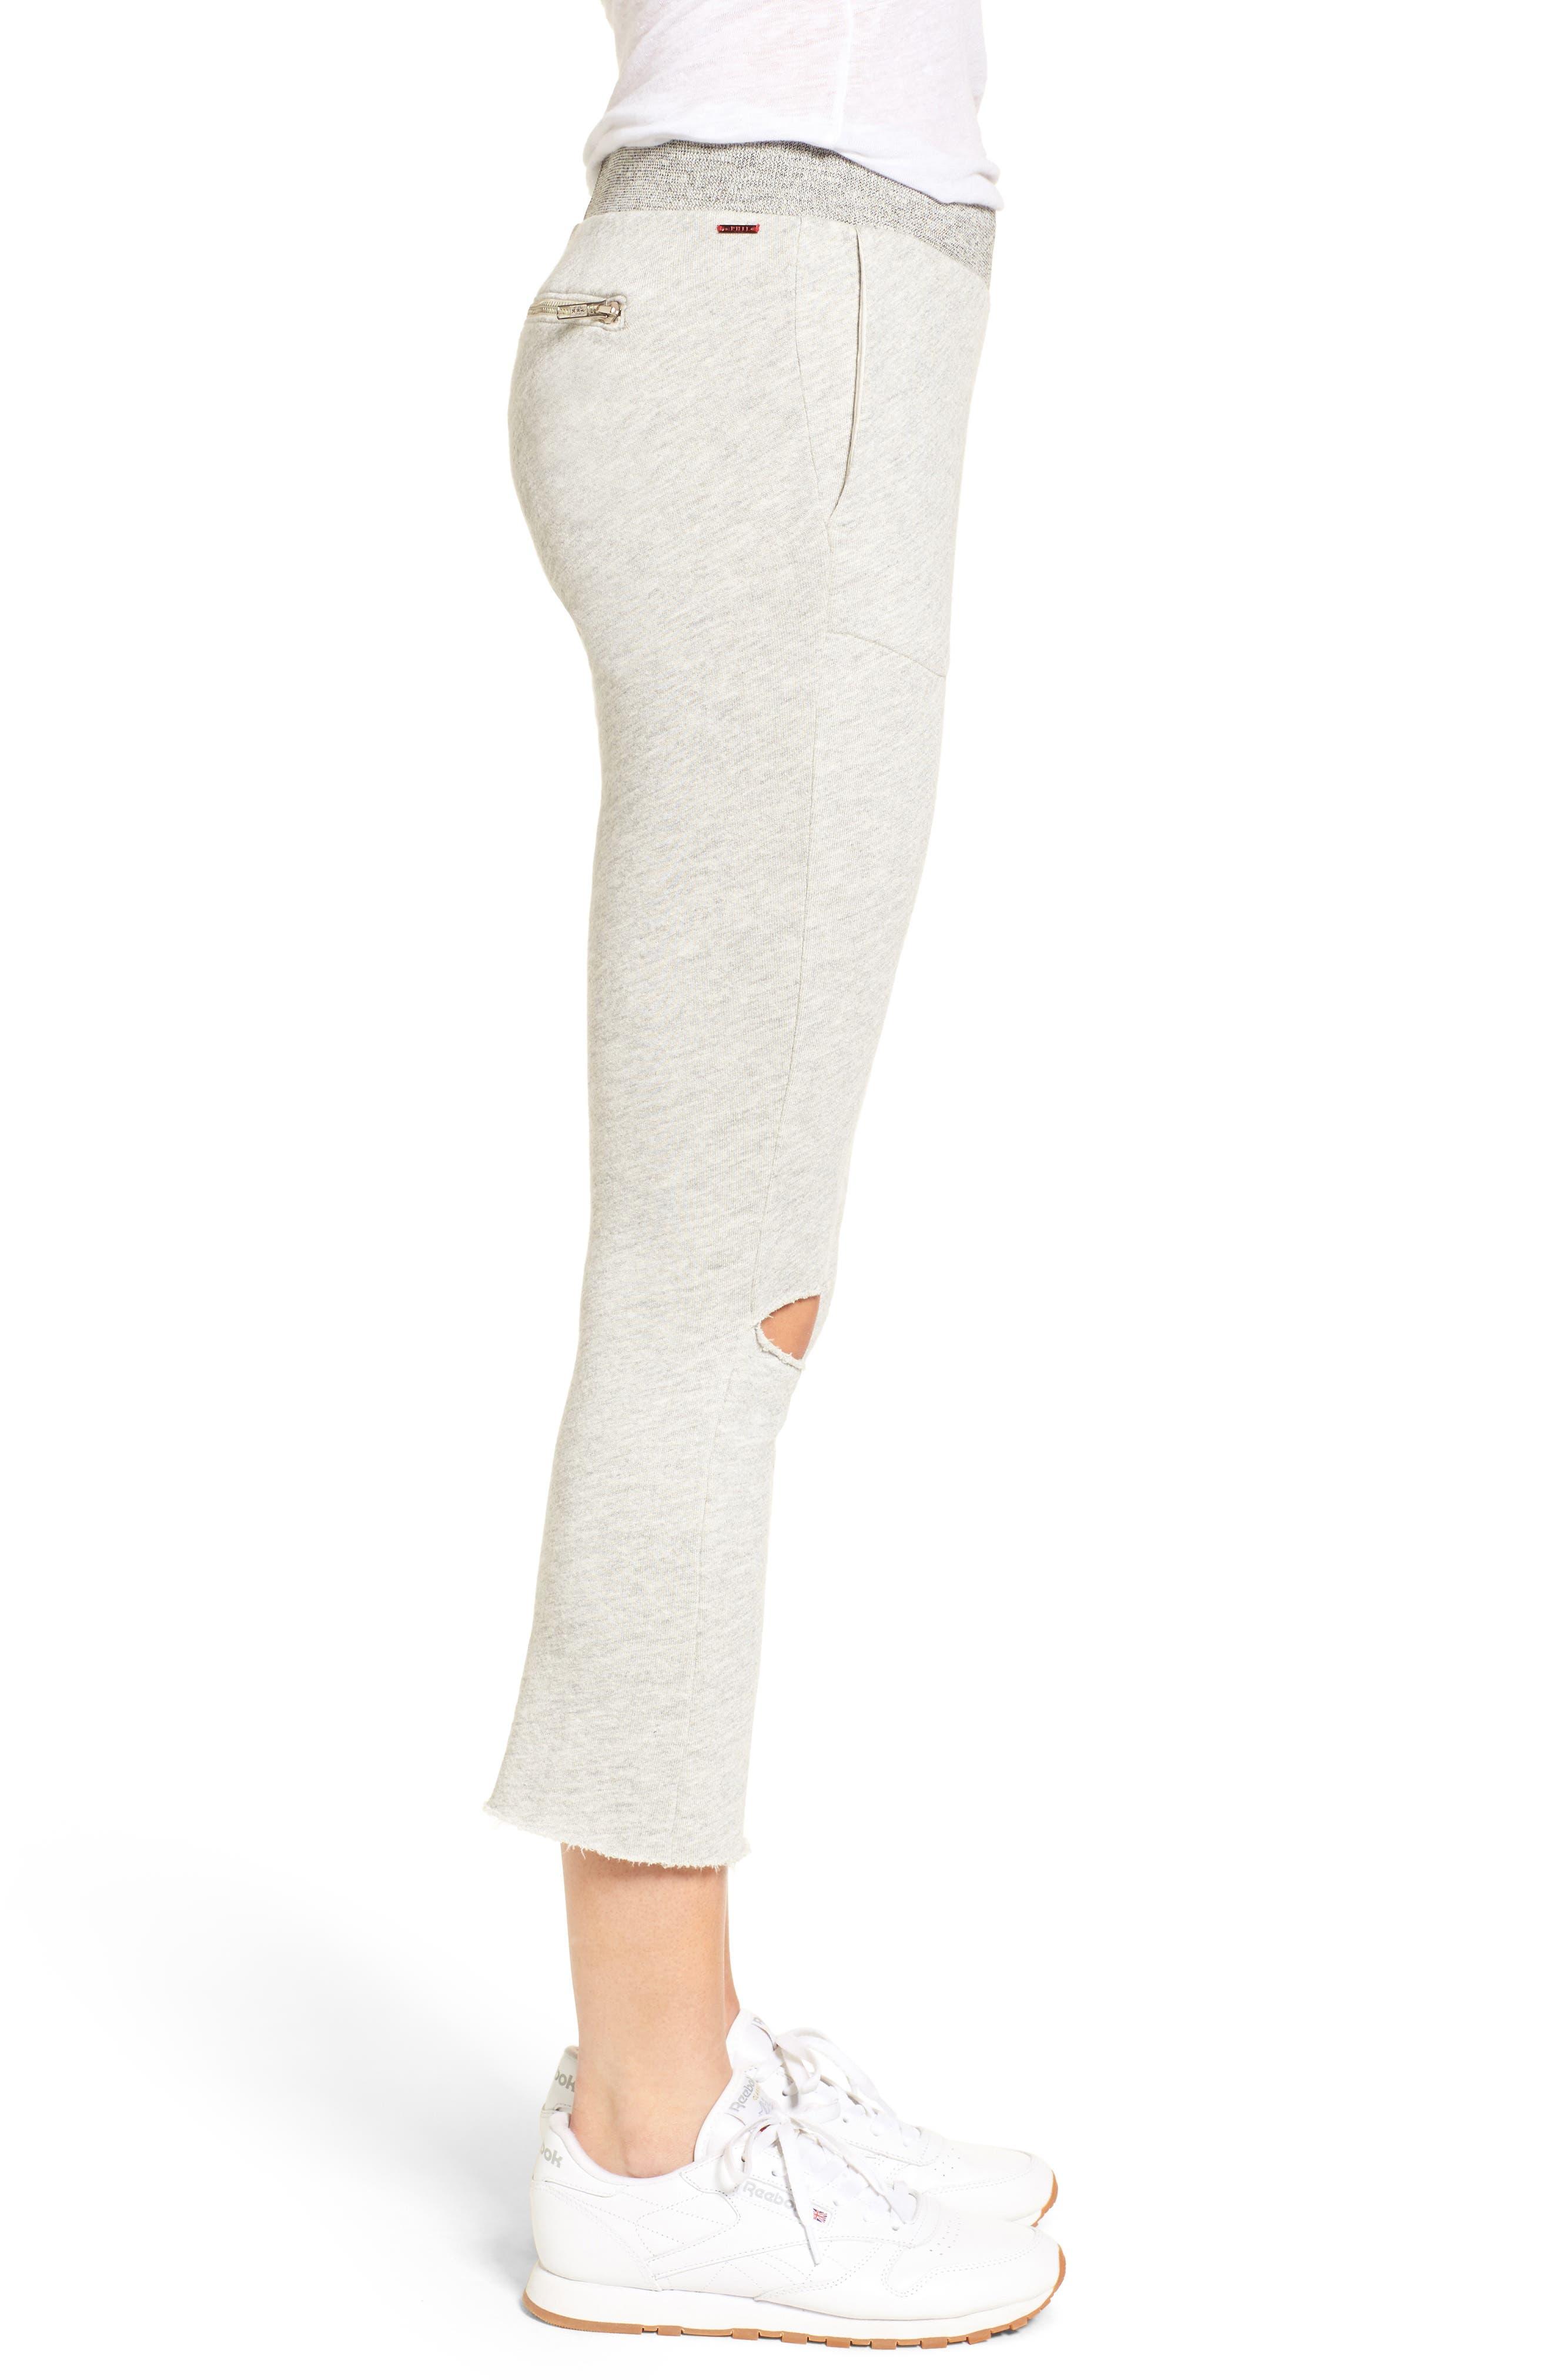 N PHILANTHROPY Malibu Slit Knee Sweatpants Gray